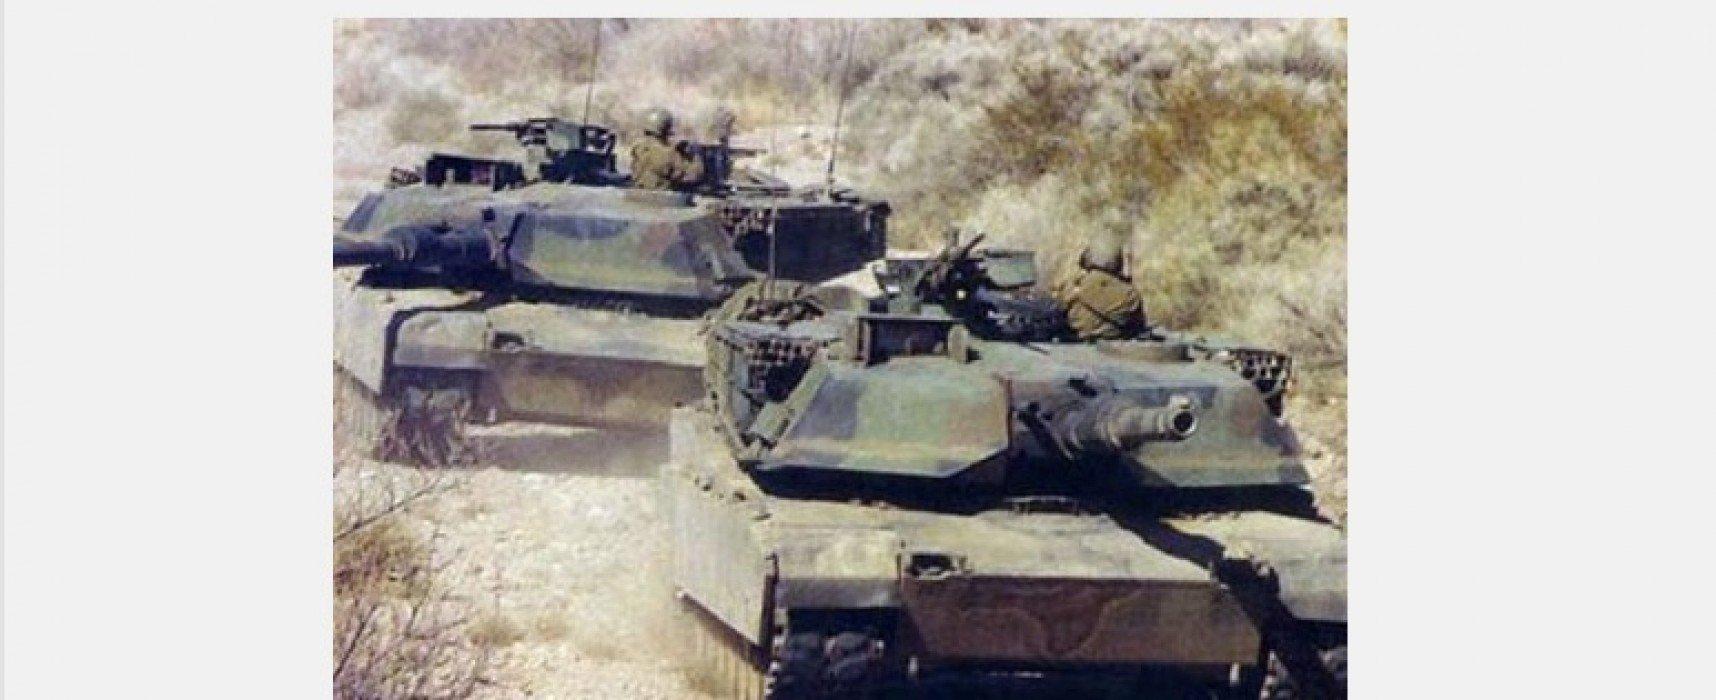 La foto falsificada del tanque de EEUU en Donbás